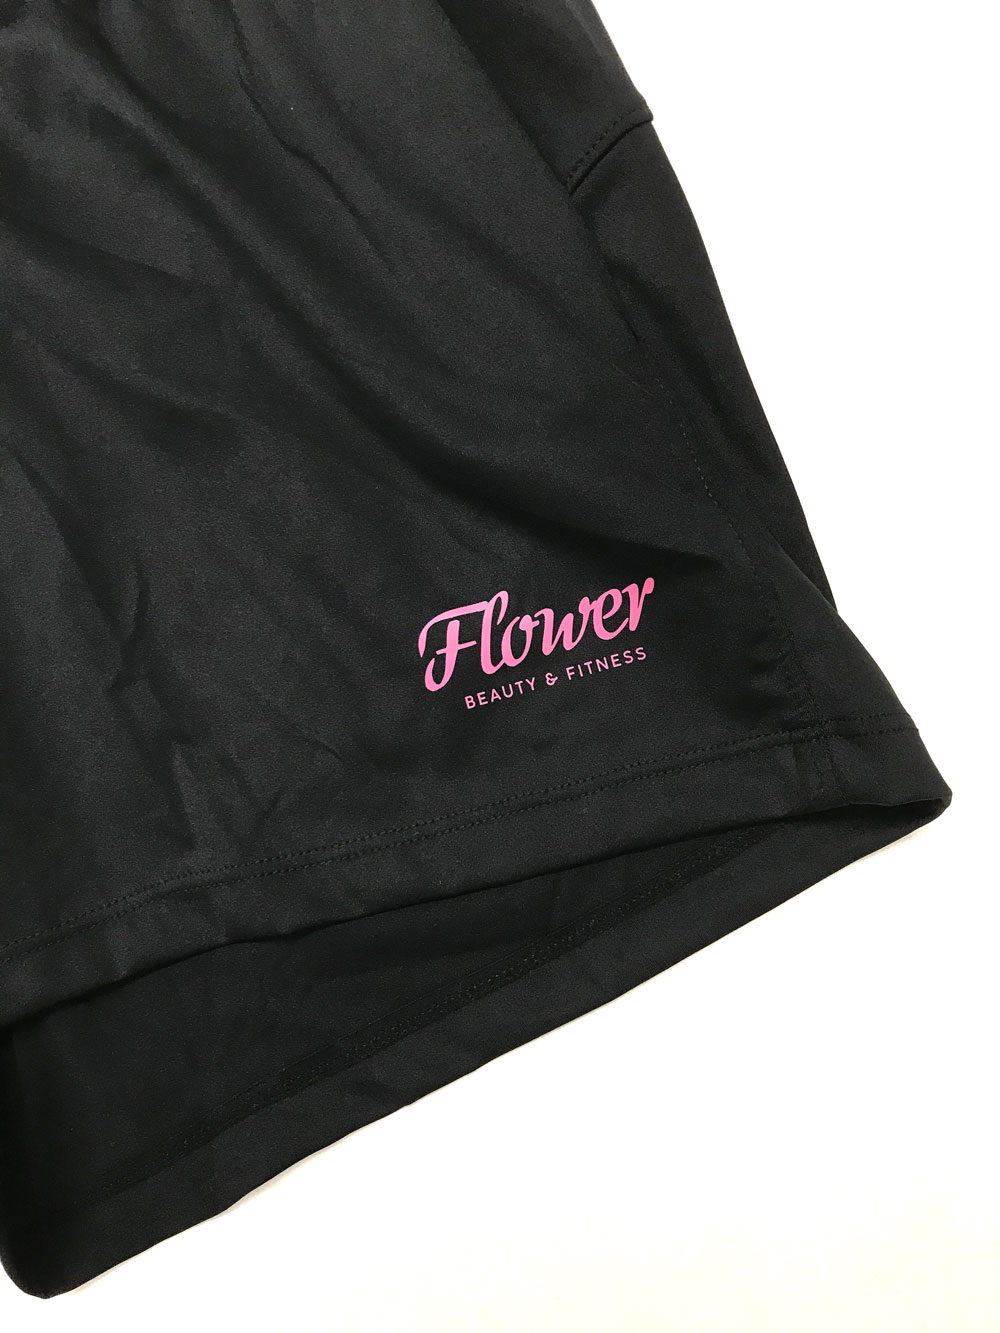 FLOWER YOGA & ACTIVE ELASTIC SHORTS